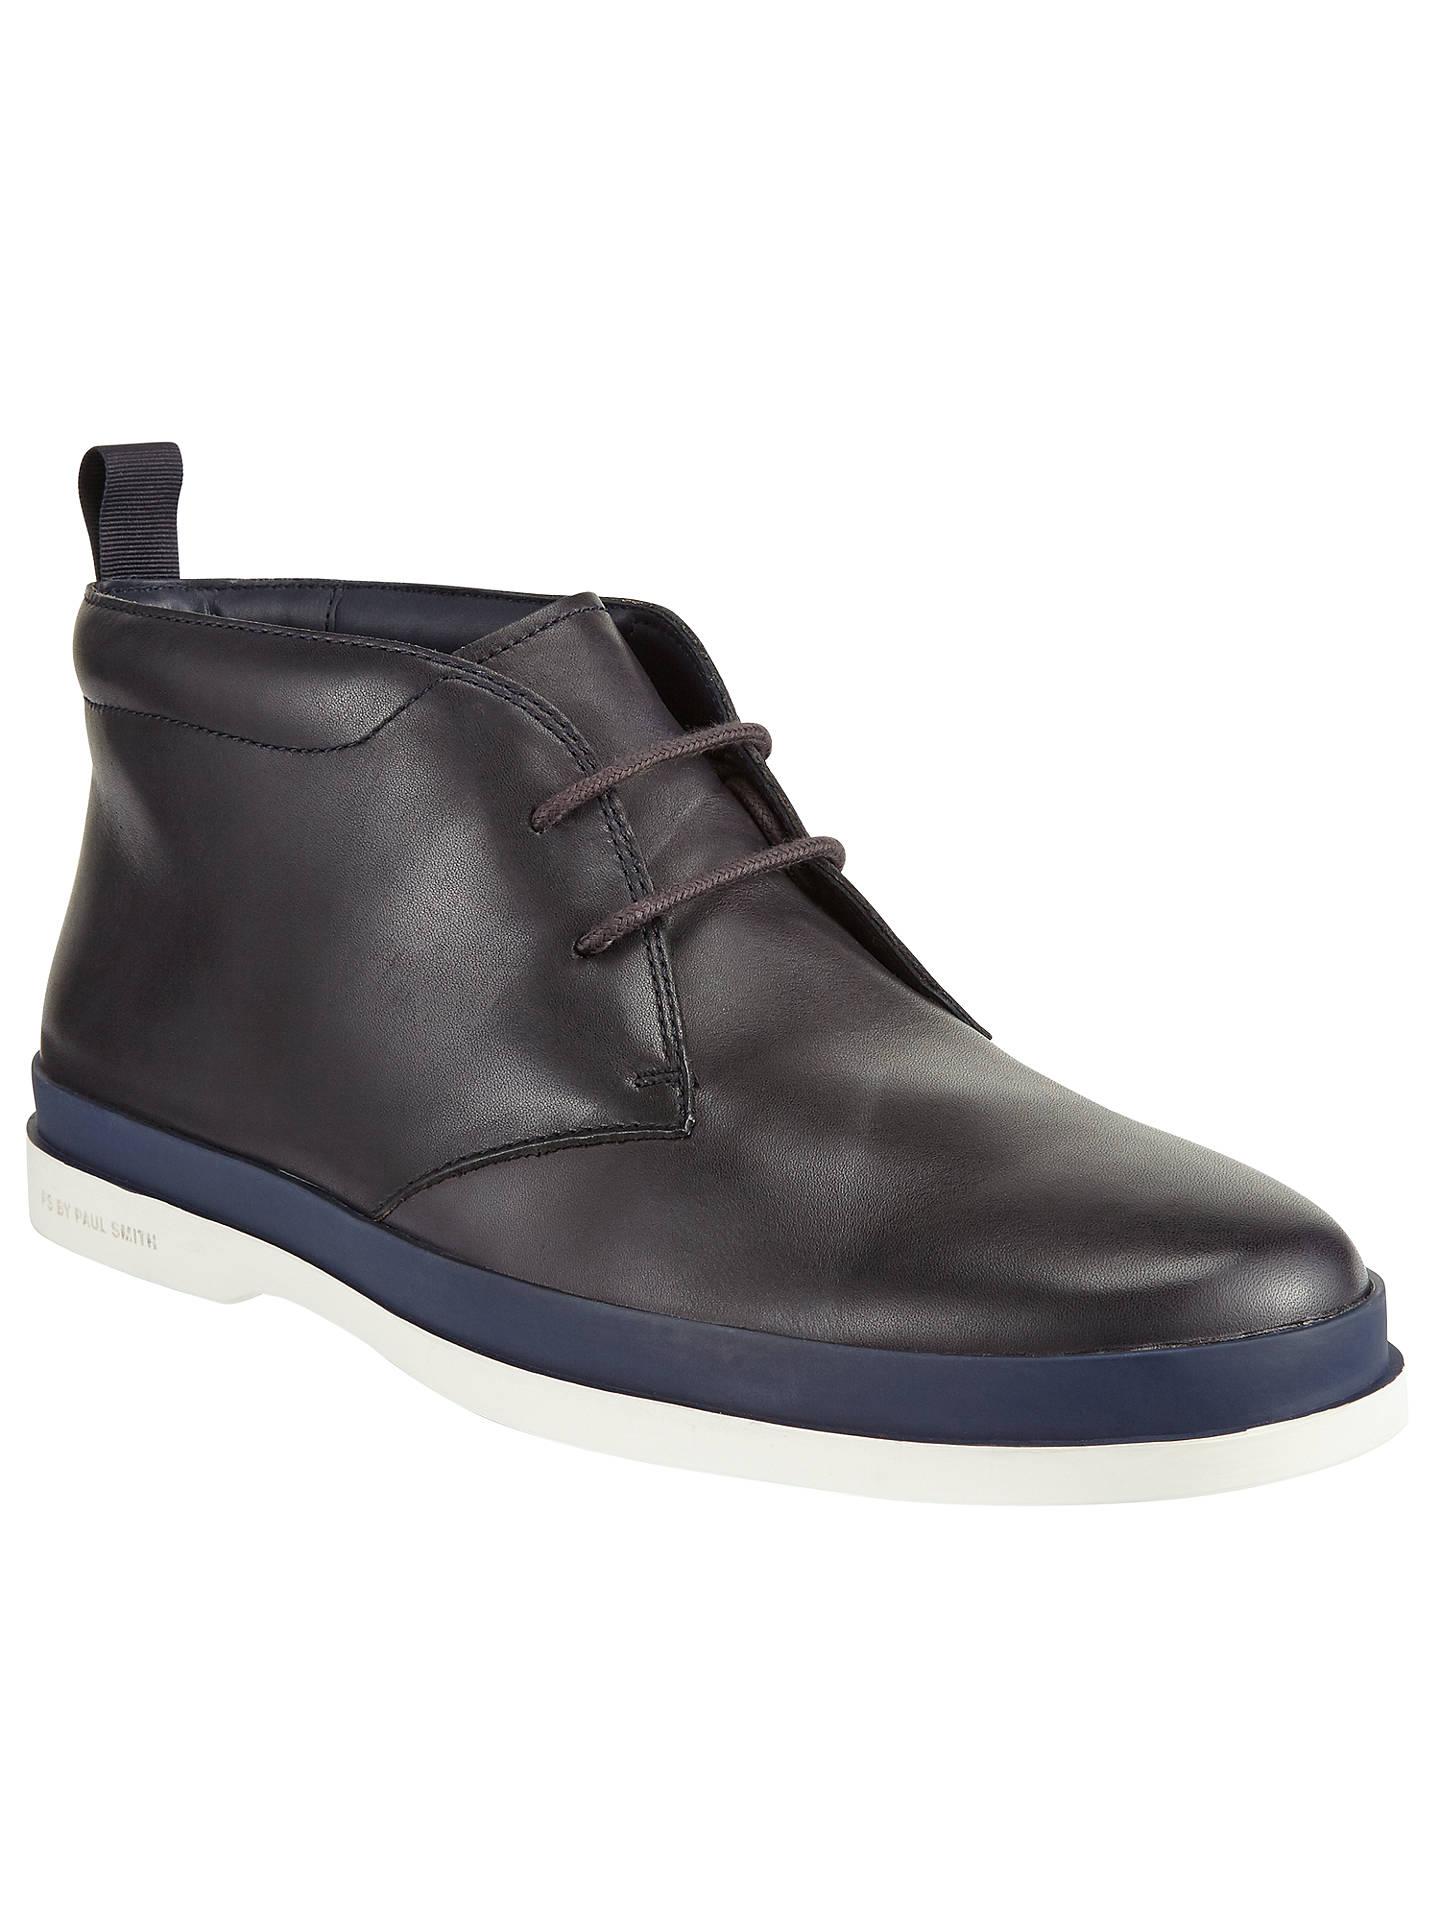 d5d4fb8bdb3 Paul Smith Inkie Chukka Boots, Navy at John Lewis & Partners